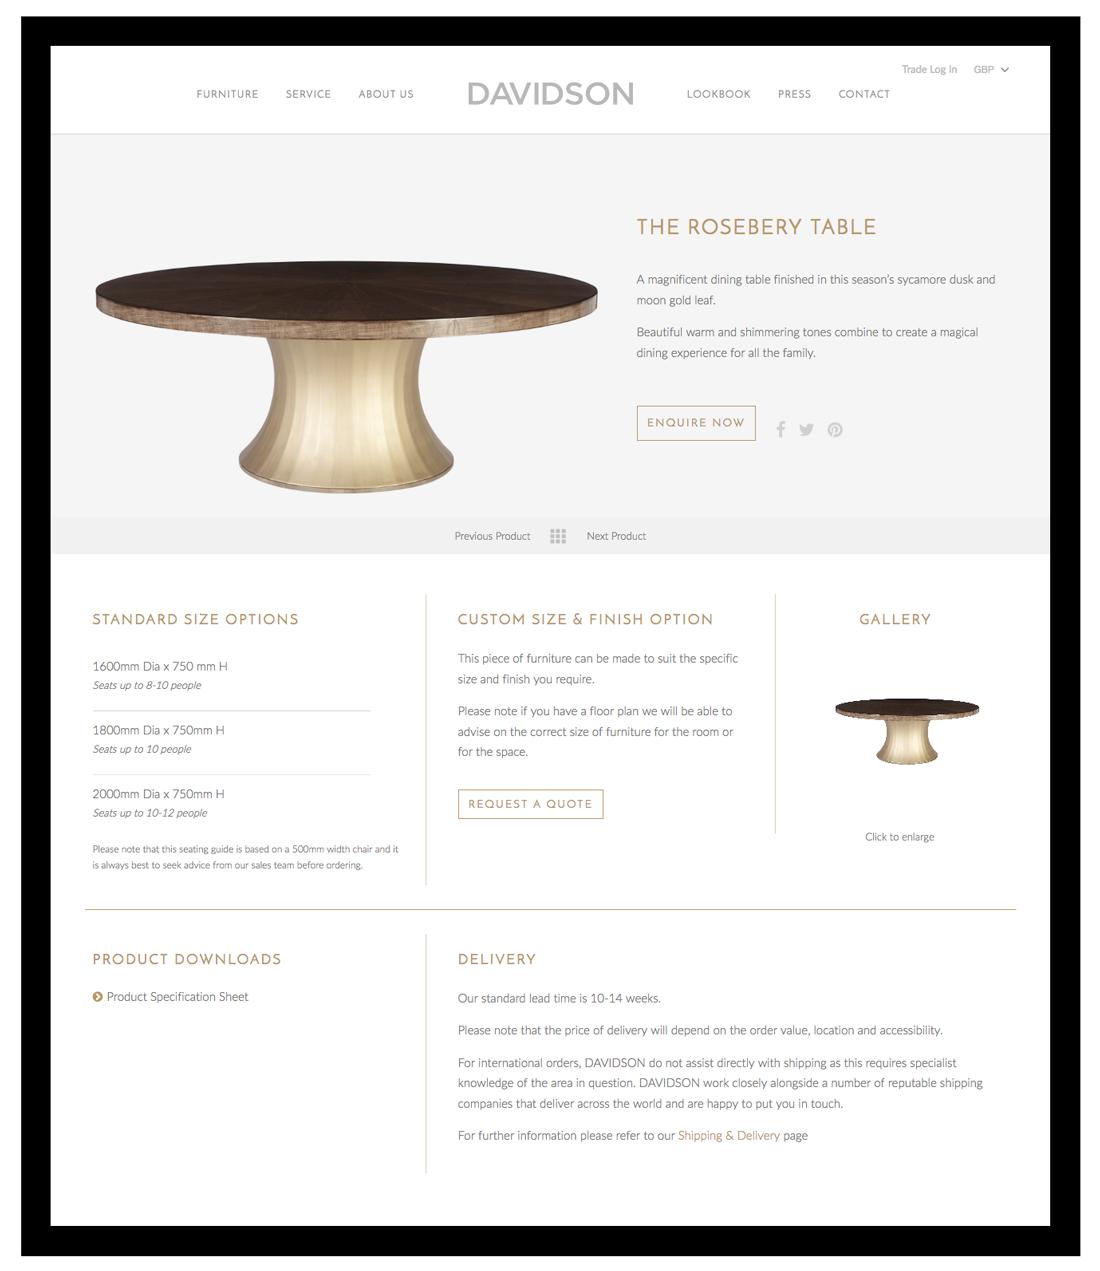 Davidson London davidson product page